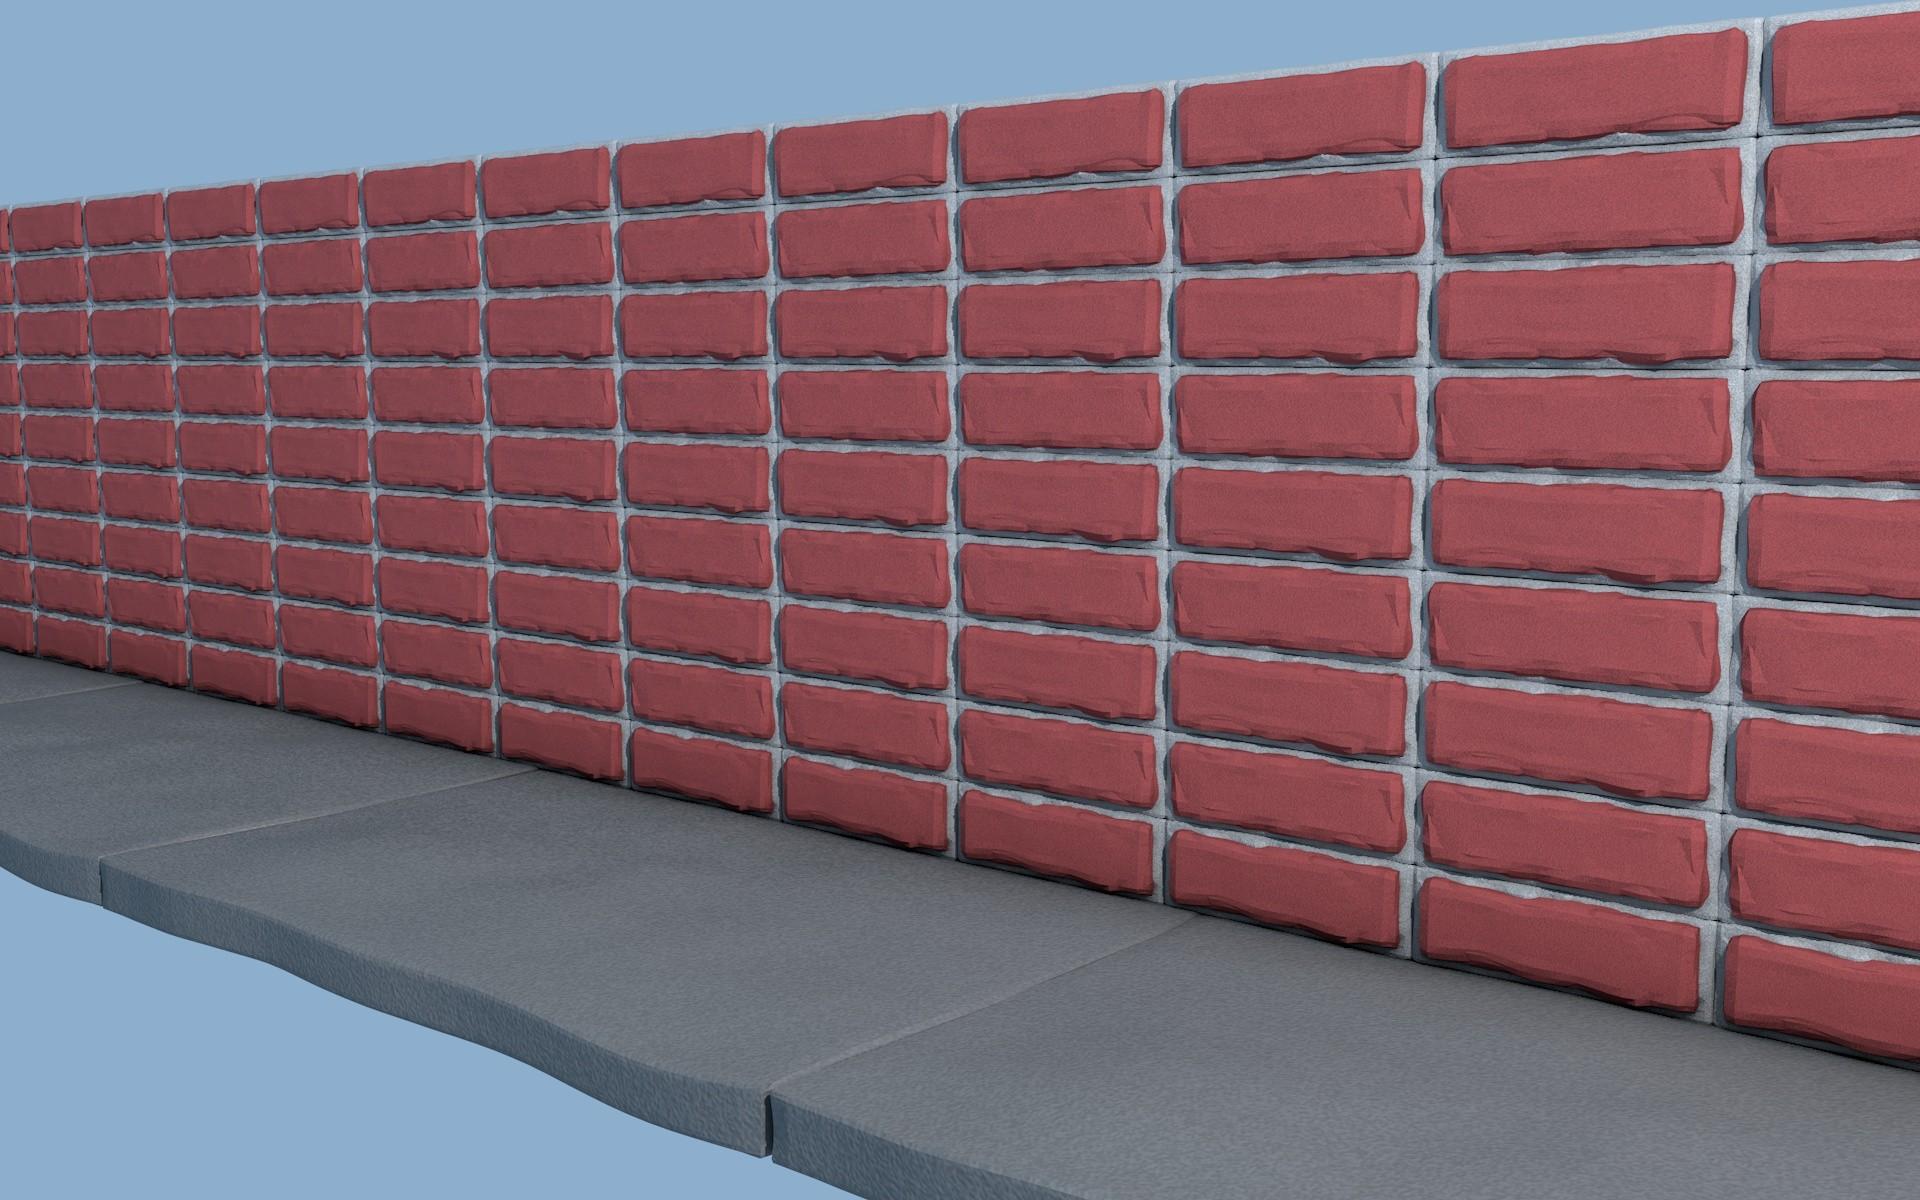 Bricks Wall0002.jpg